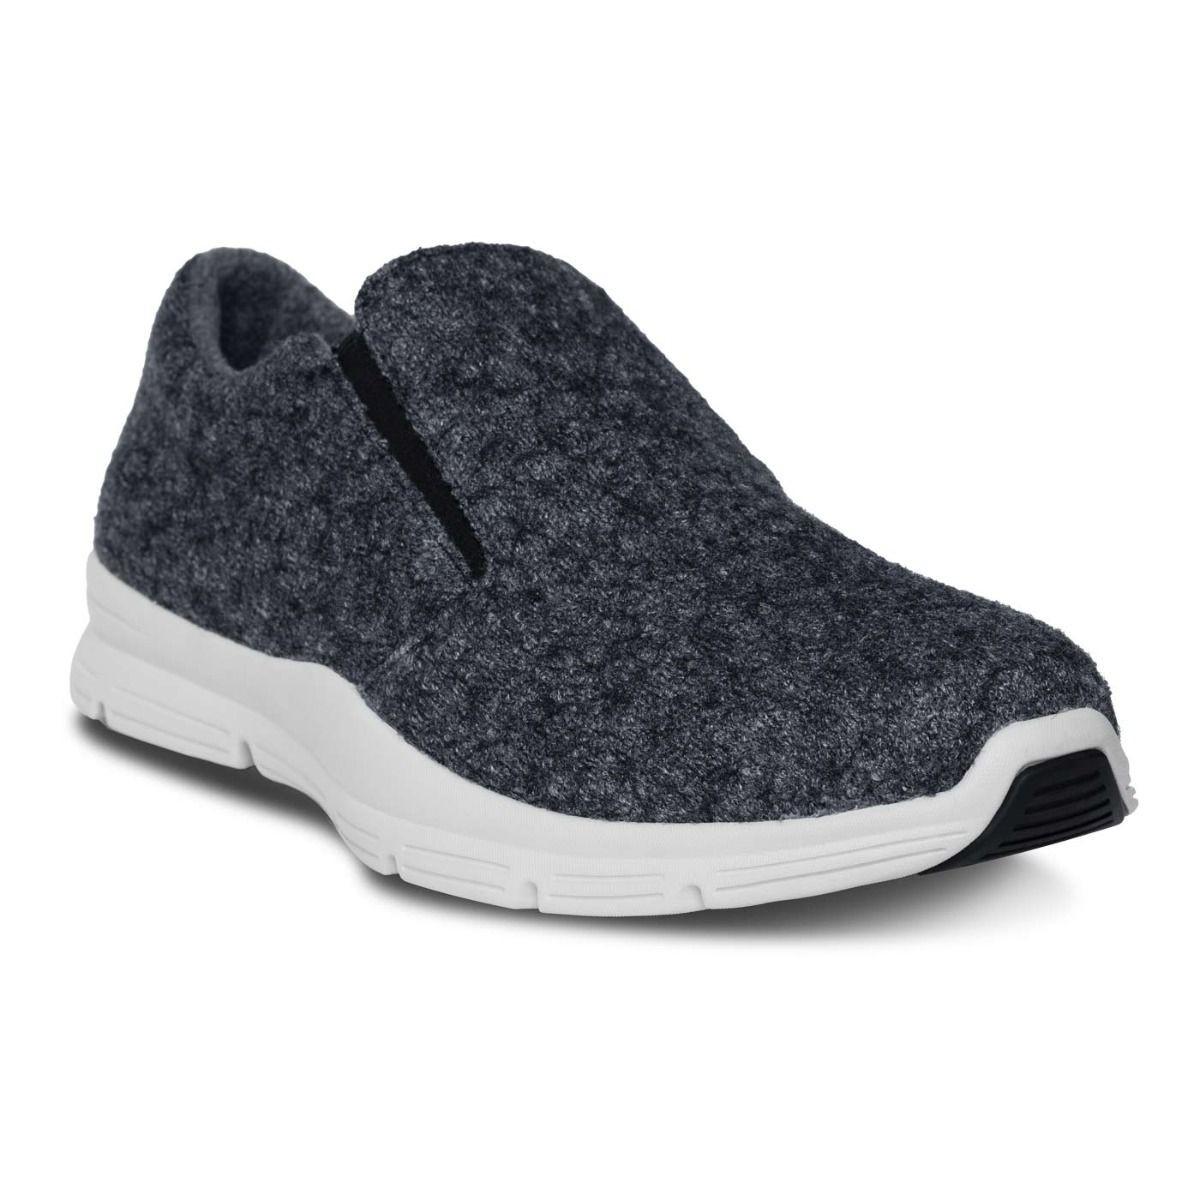 Liam Men's - Athletic Casual Wool Shoe